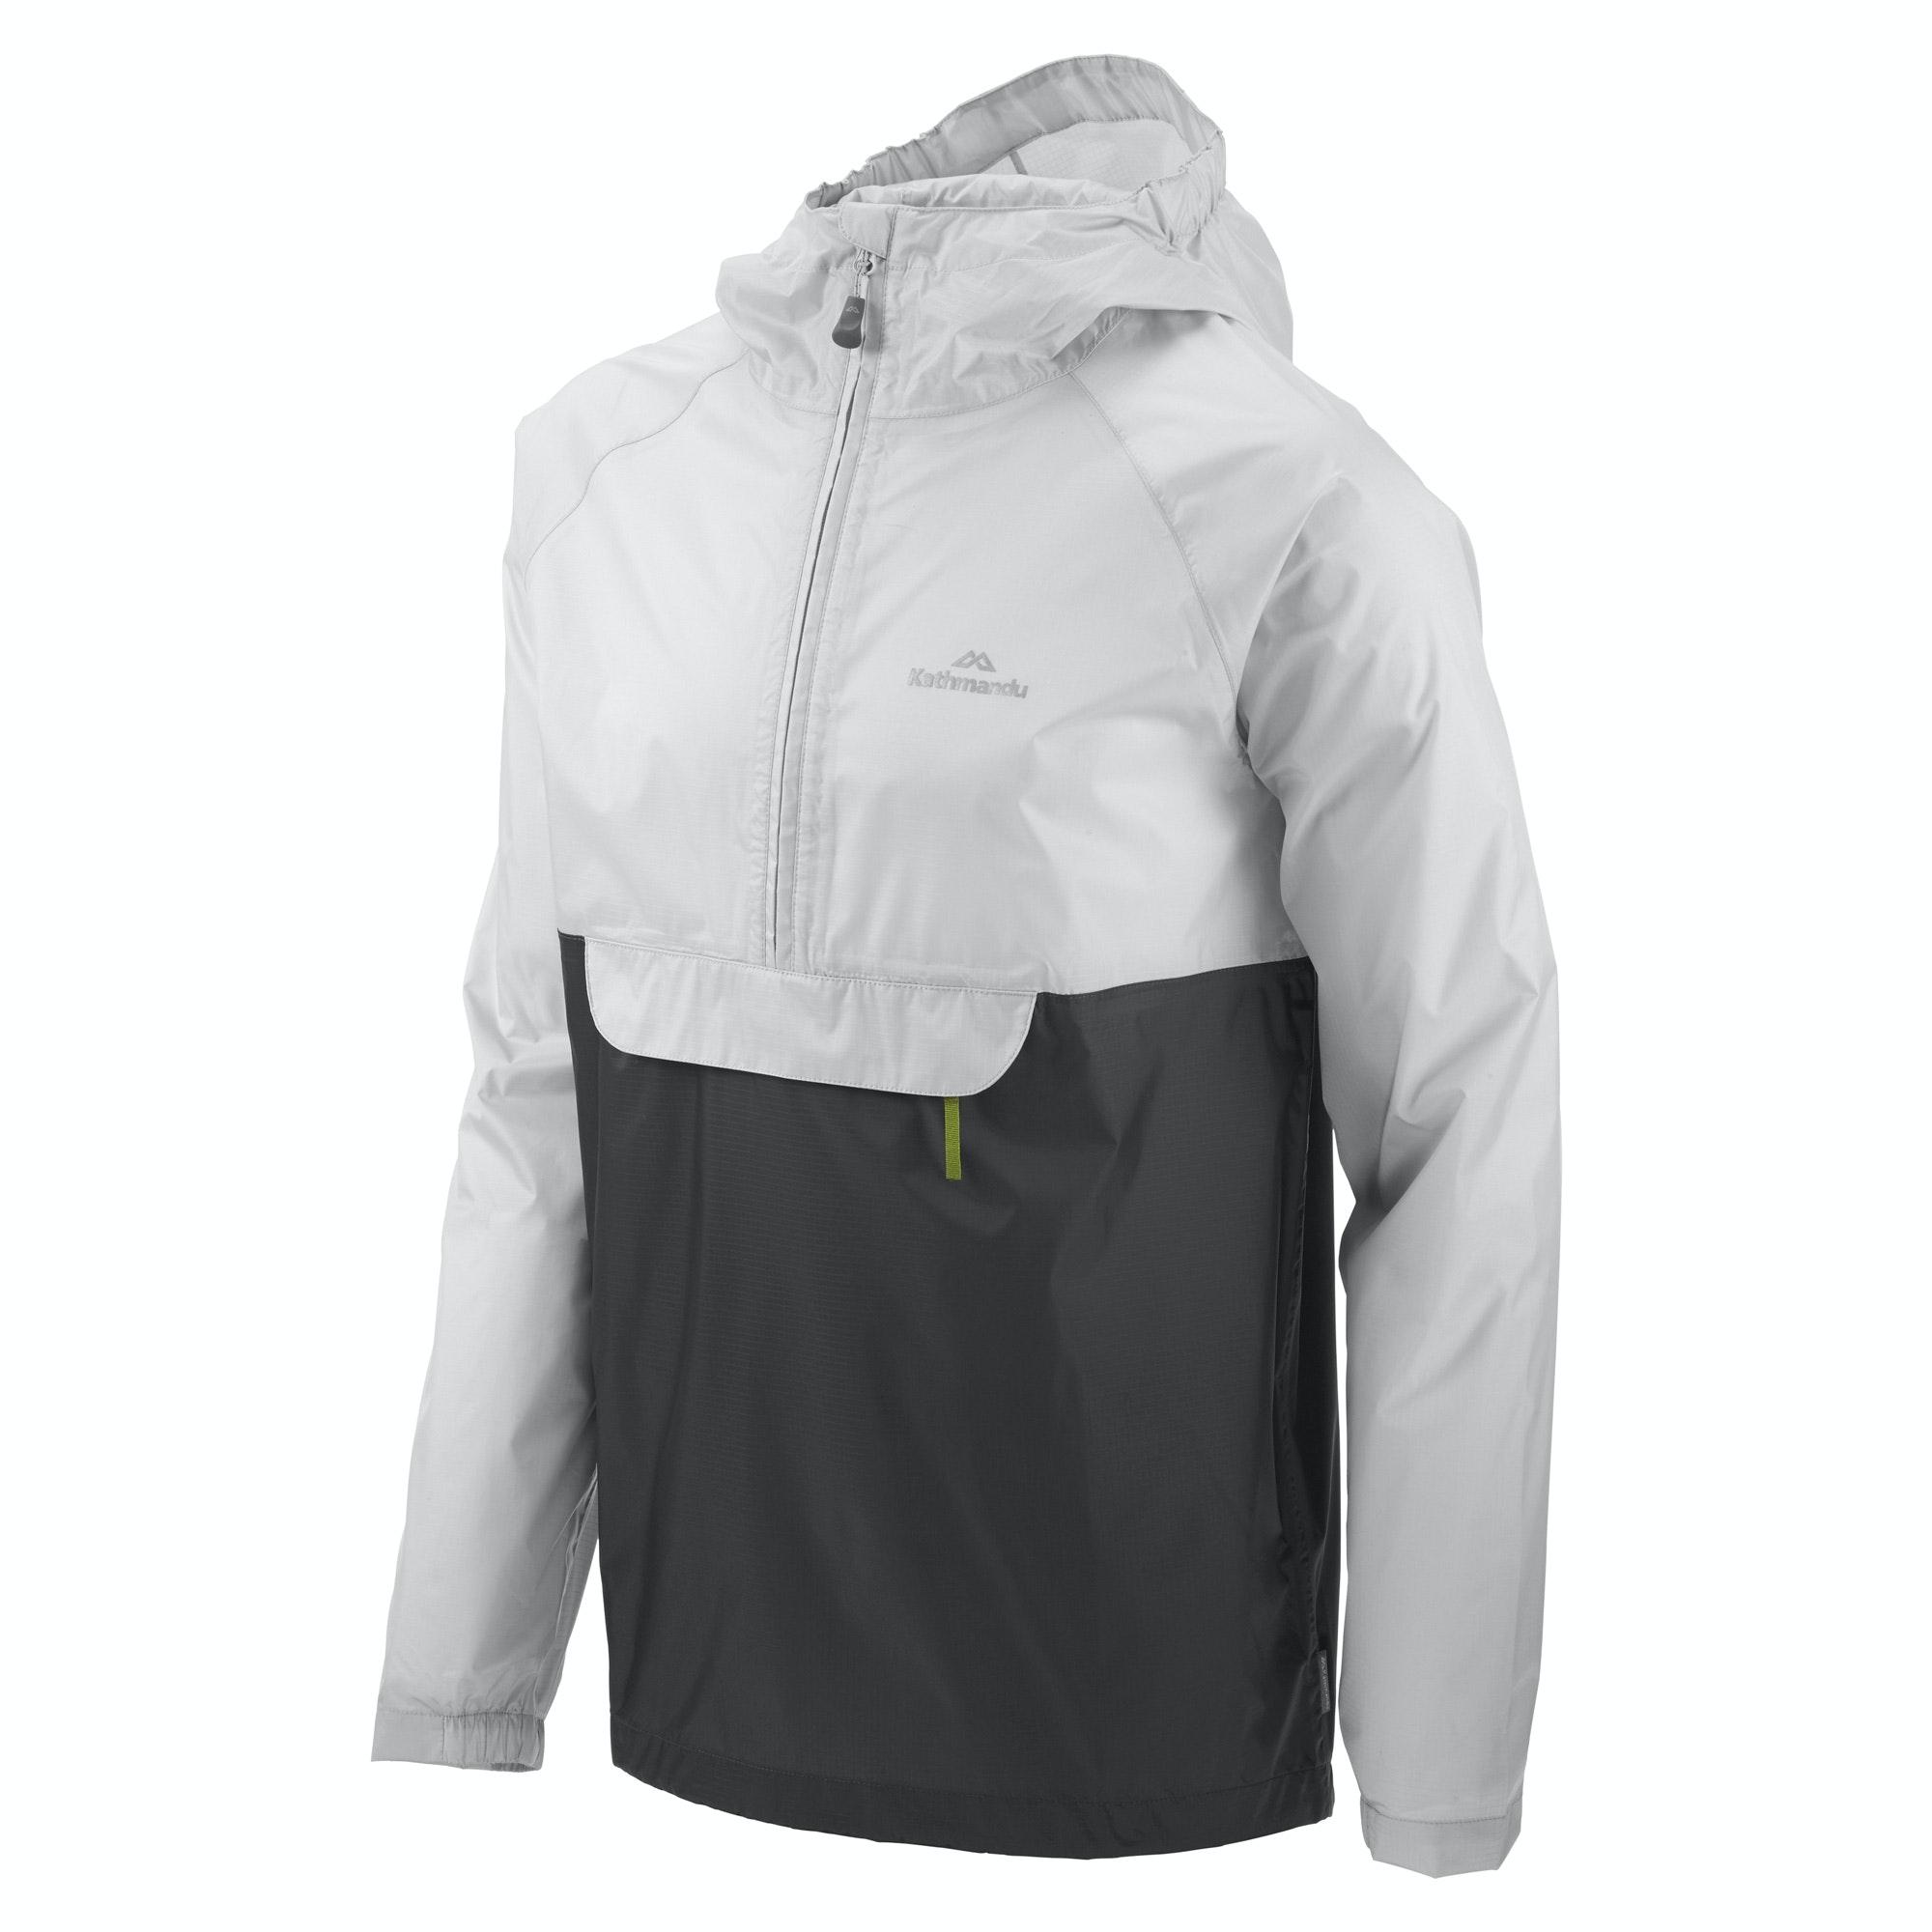 how to fold kathmandu pack and go jacket